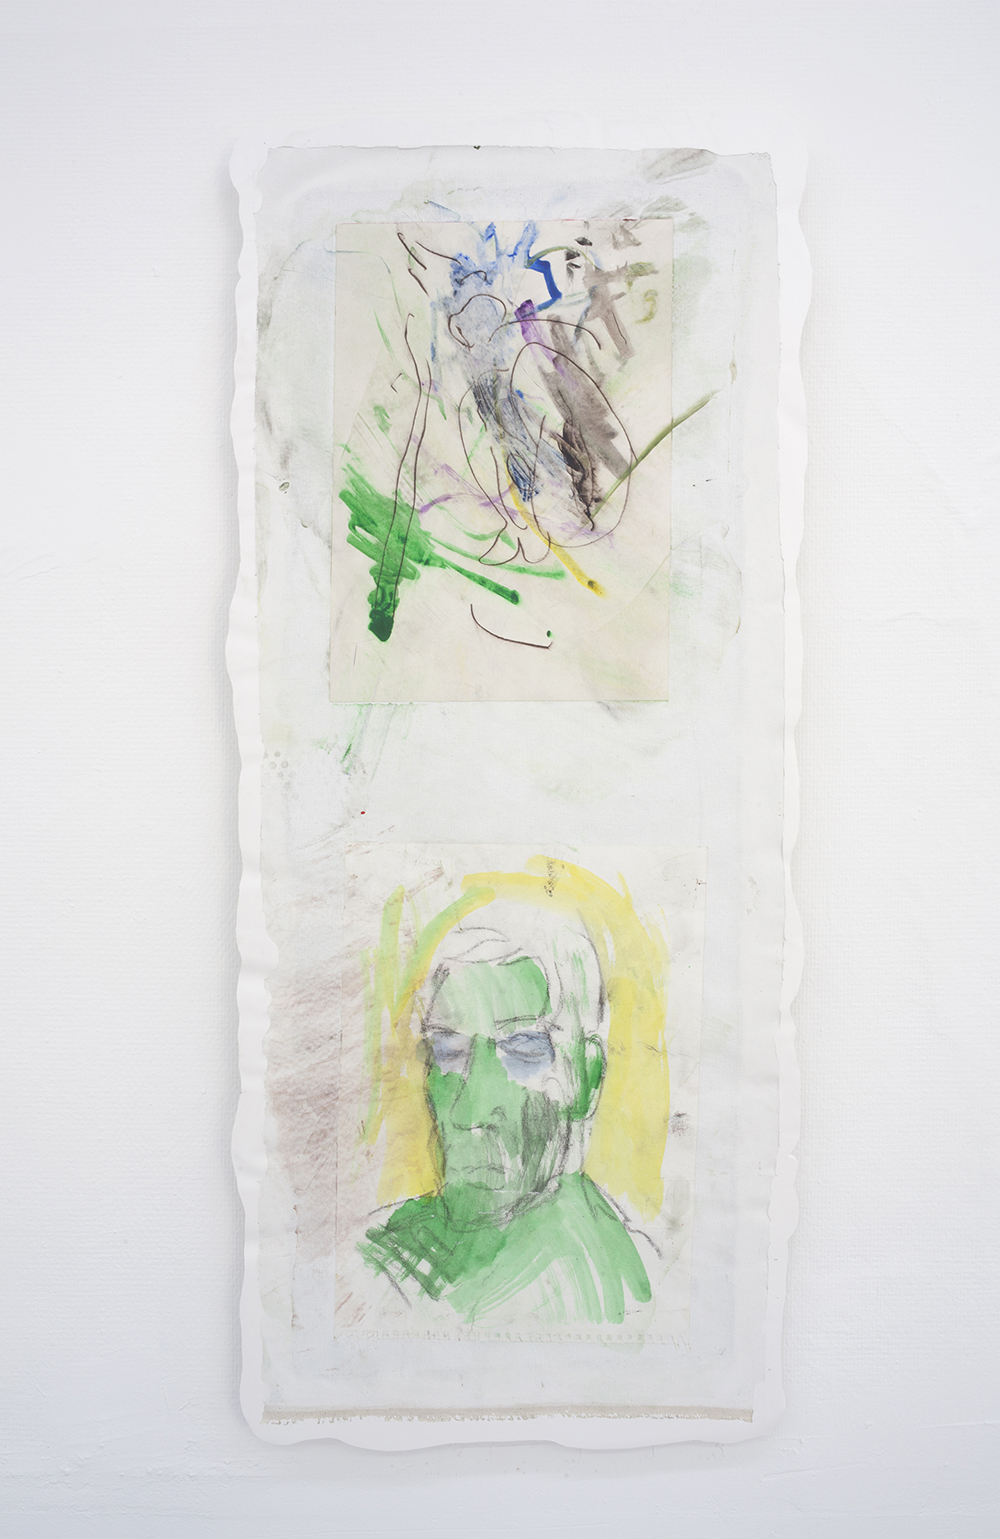 TMNT self portrait with Donatello, 2017-2018. (Watercolour, paper, wet room glue, resin, fiberglass, mdf, plaster, 46x110cm).